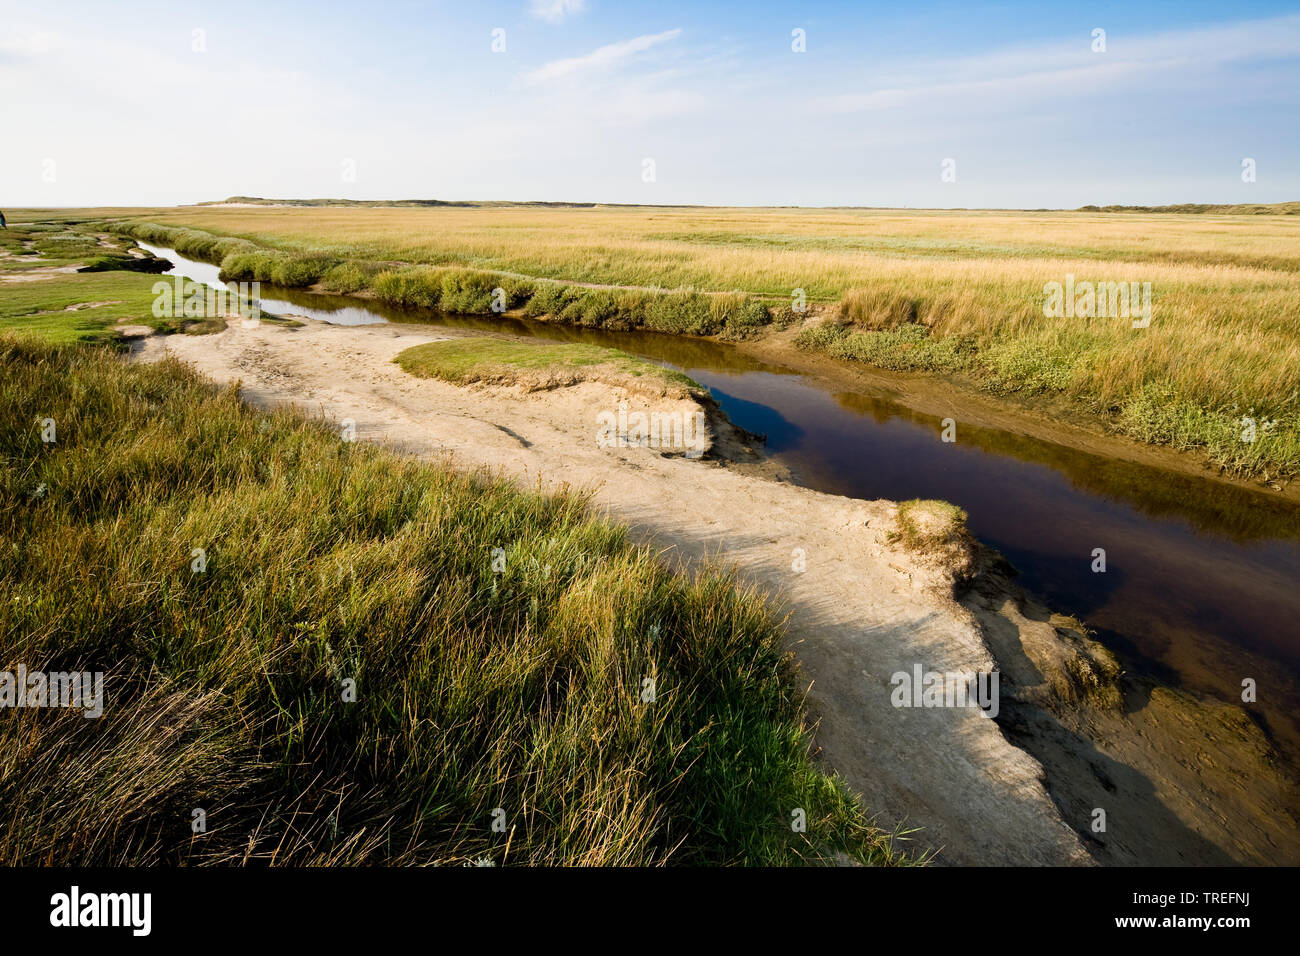 Priel in den Salzwiesen De Slufter, Niederlande, Texel, De Slufter, De Slufter   marsh meadows De Slufter with tide way, Netherlands, Texel, De Slufte - Stock Image